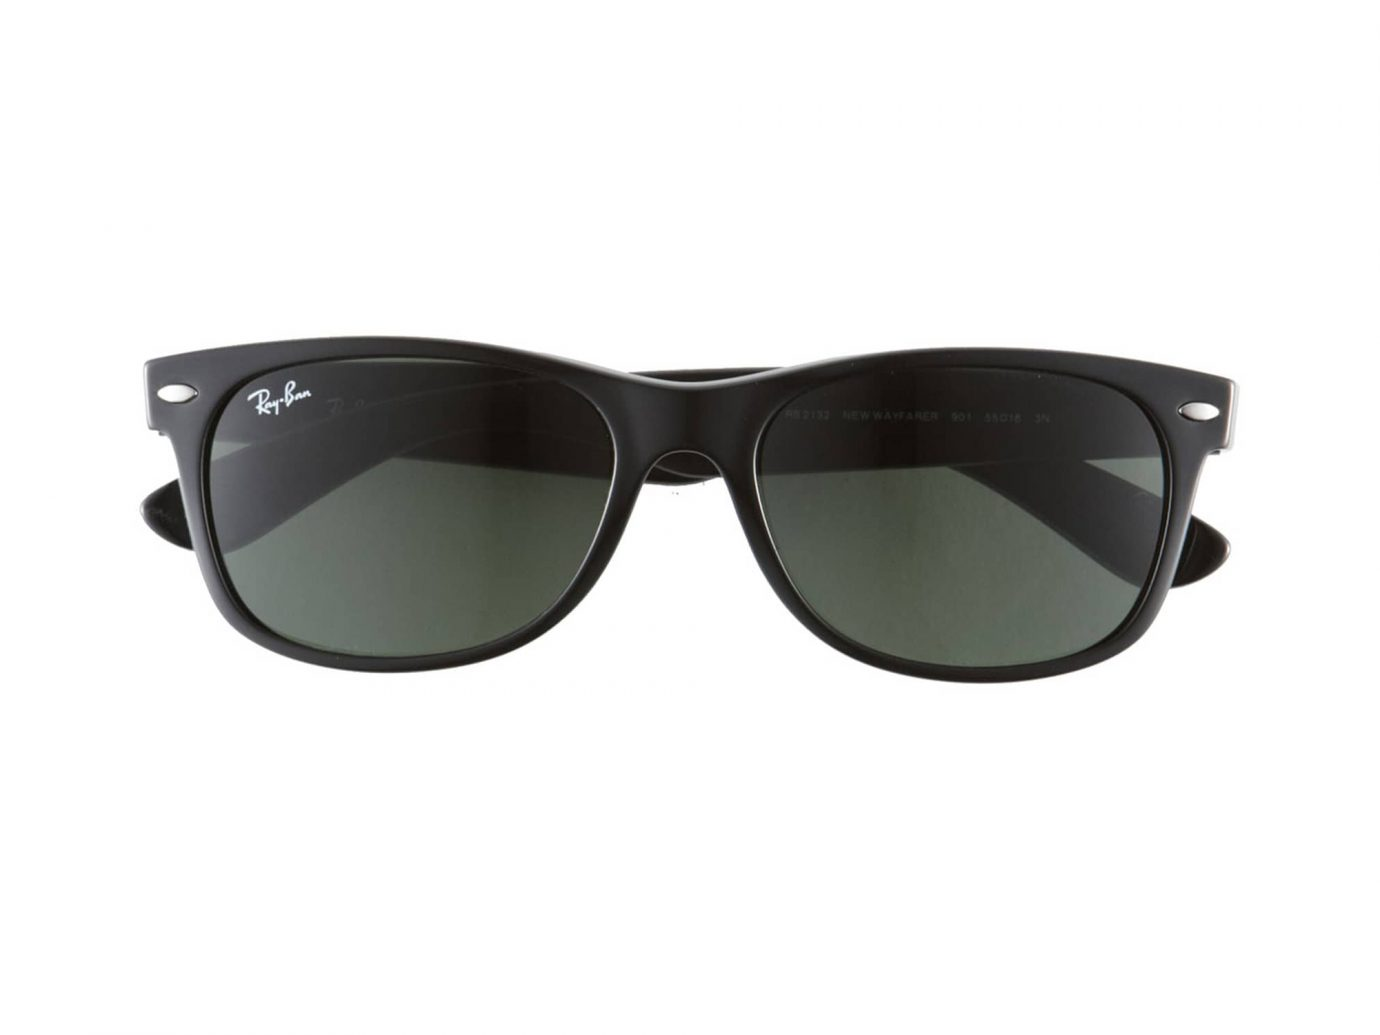 Ray-Ban Wayfarer 55mm Sunglasses